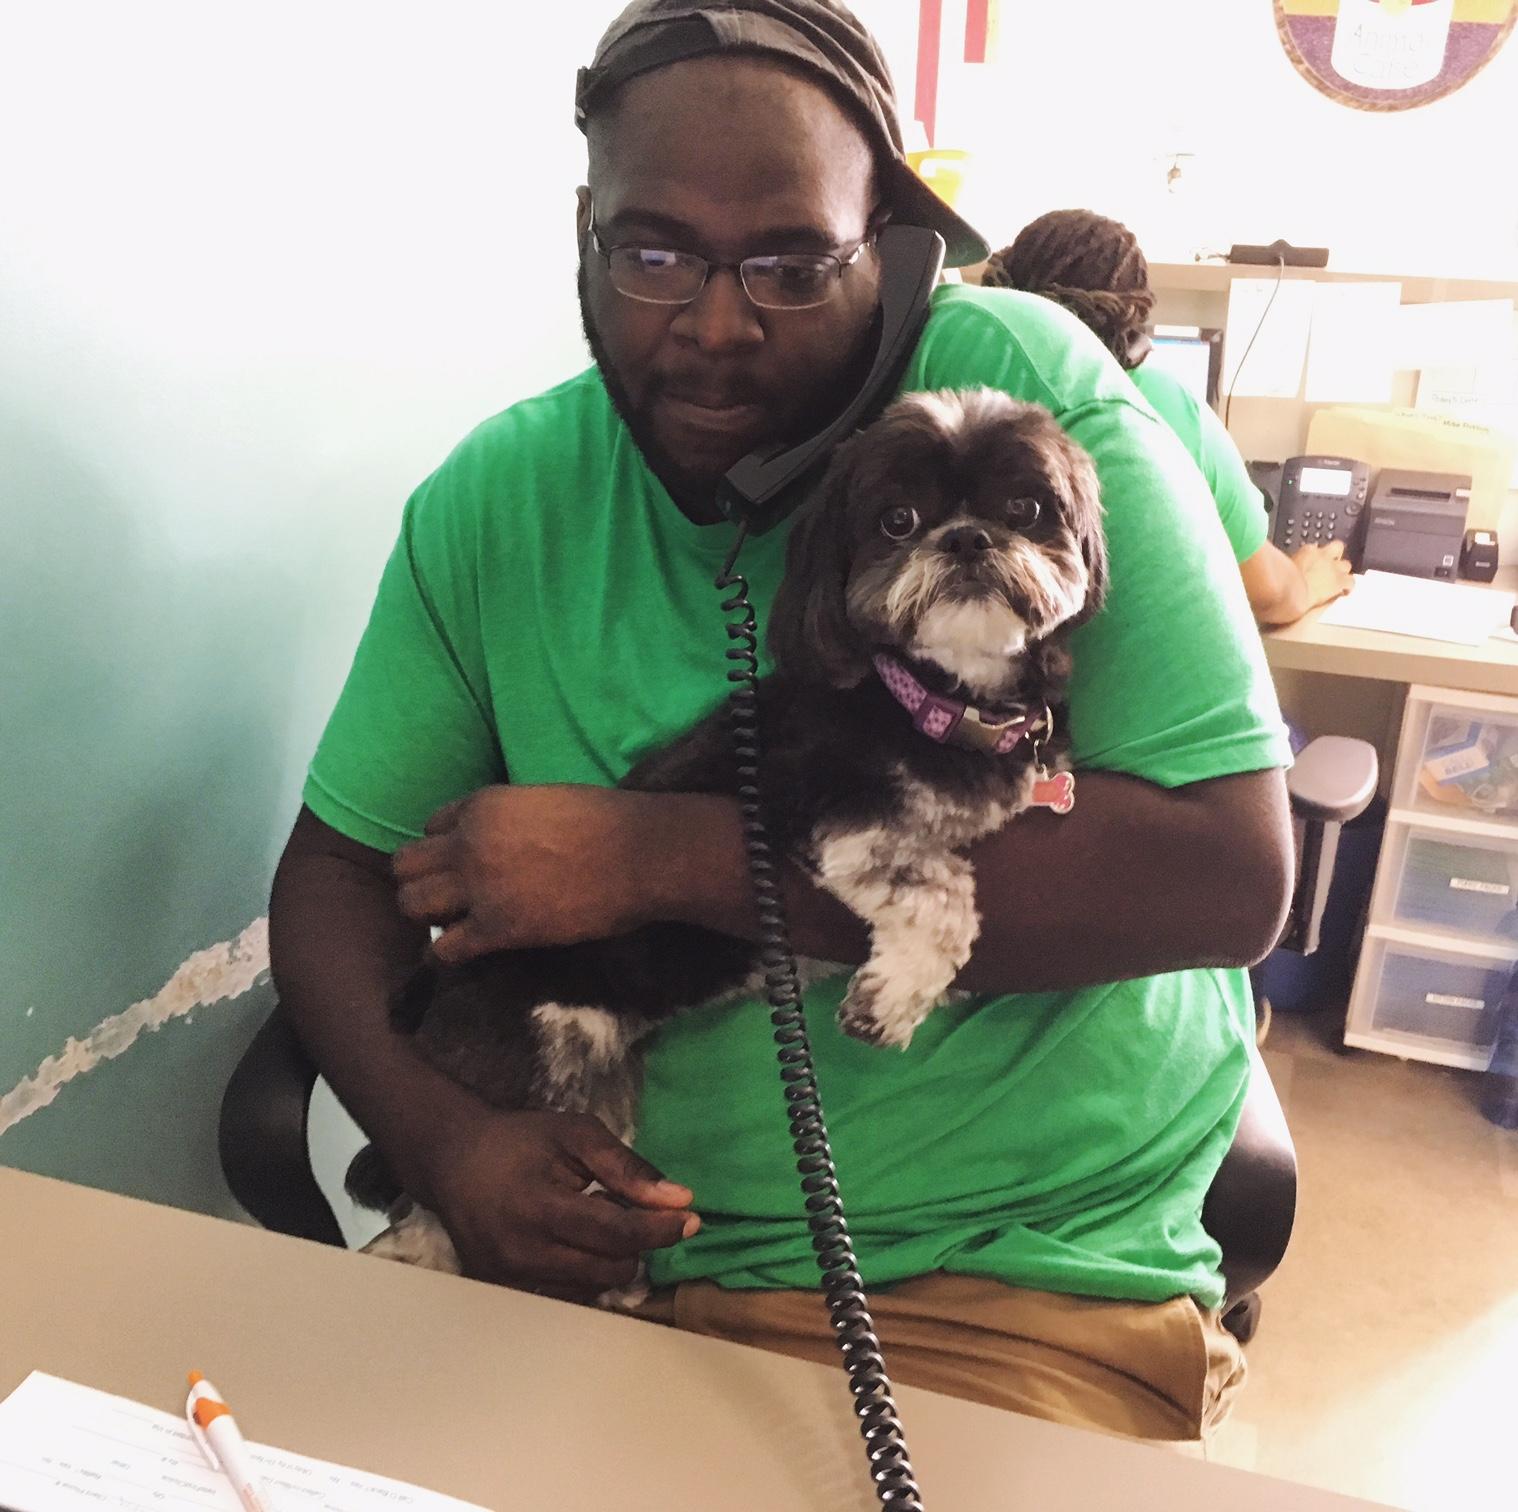 Clarendon Animal Care Veterinary Clinic Arlington Virginia receptionist holding a dog